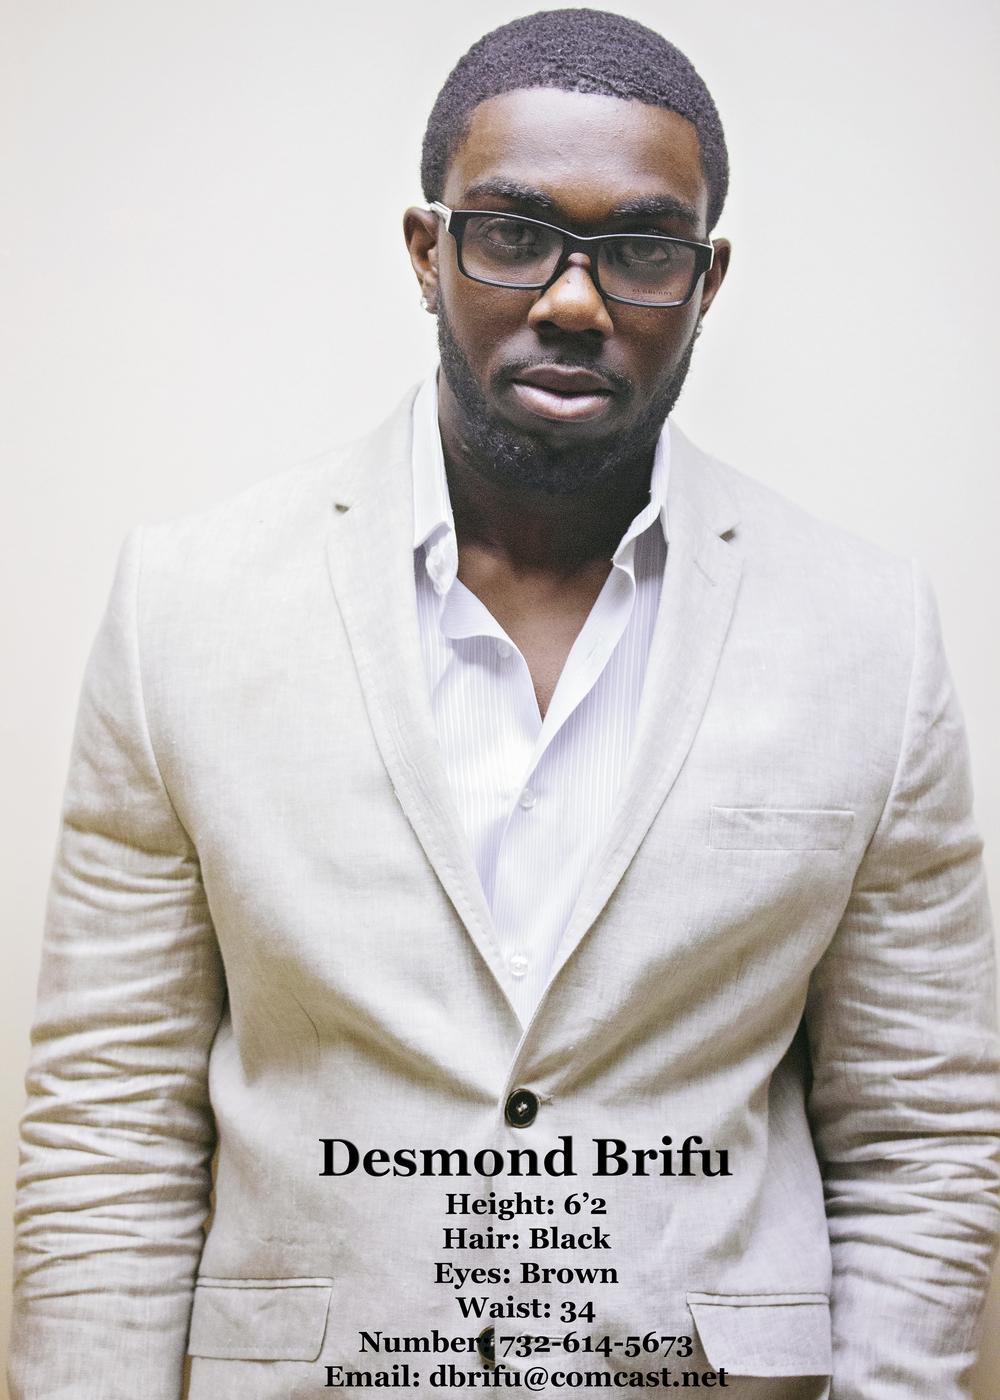 Desmond Brifu